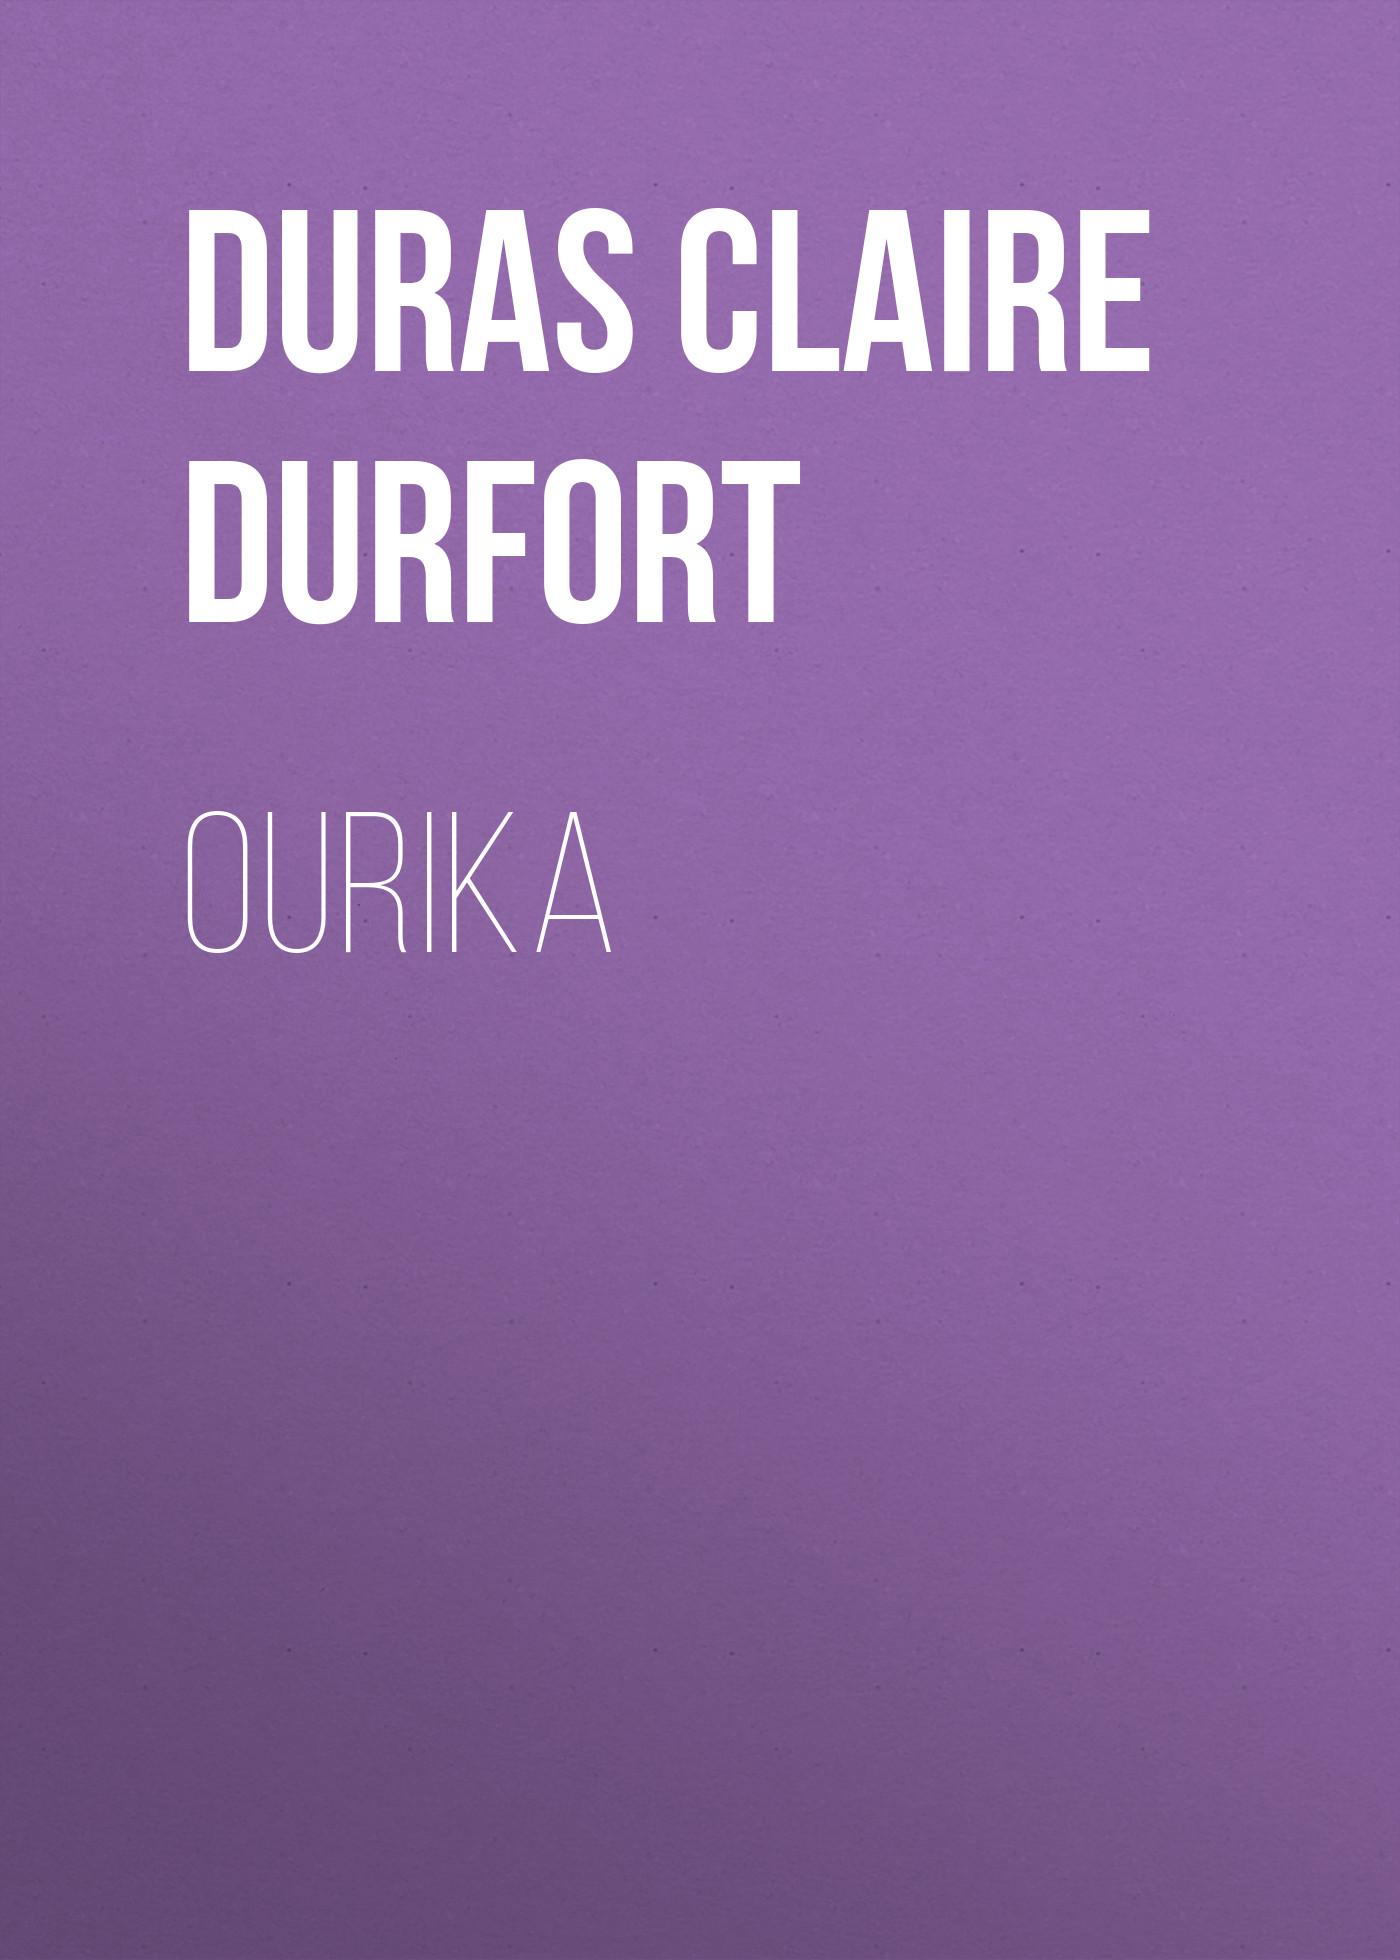 Duras Claire de Durfort Ourika масленка gipfel 9360 claire